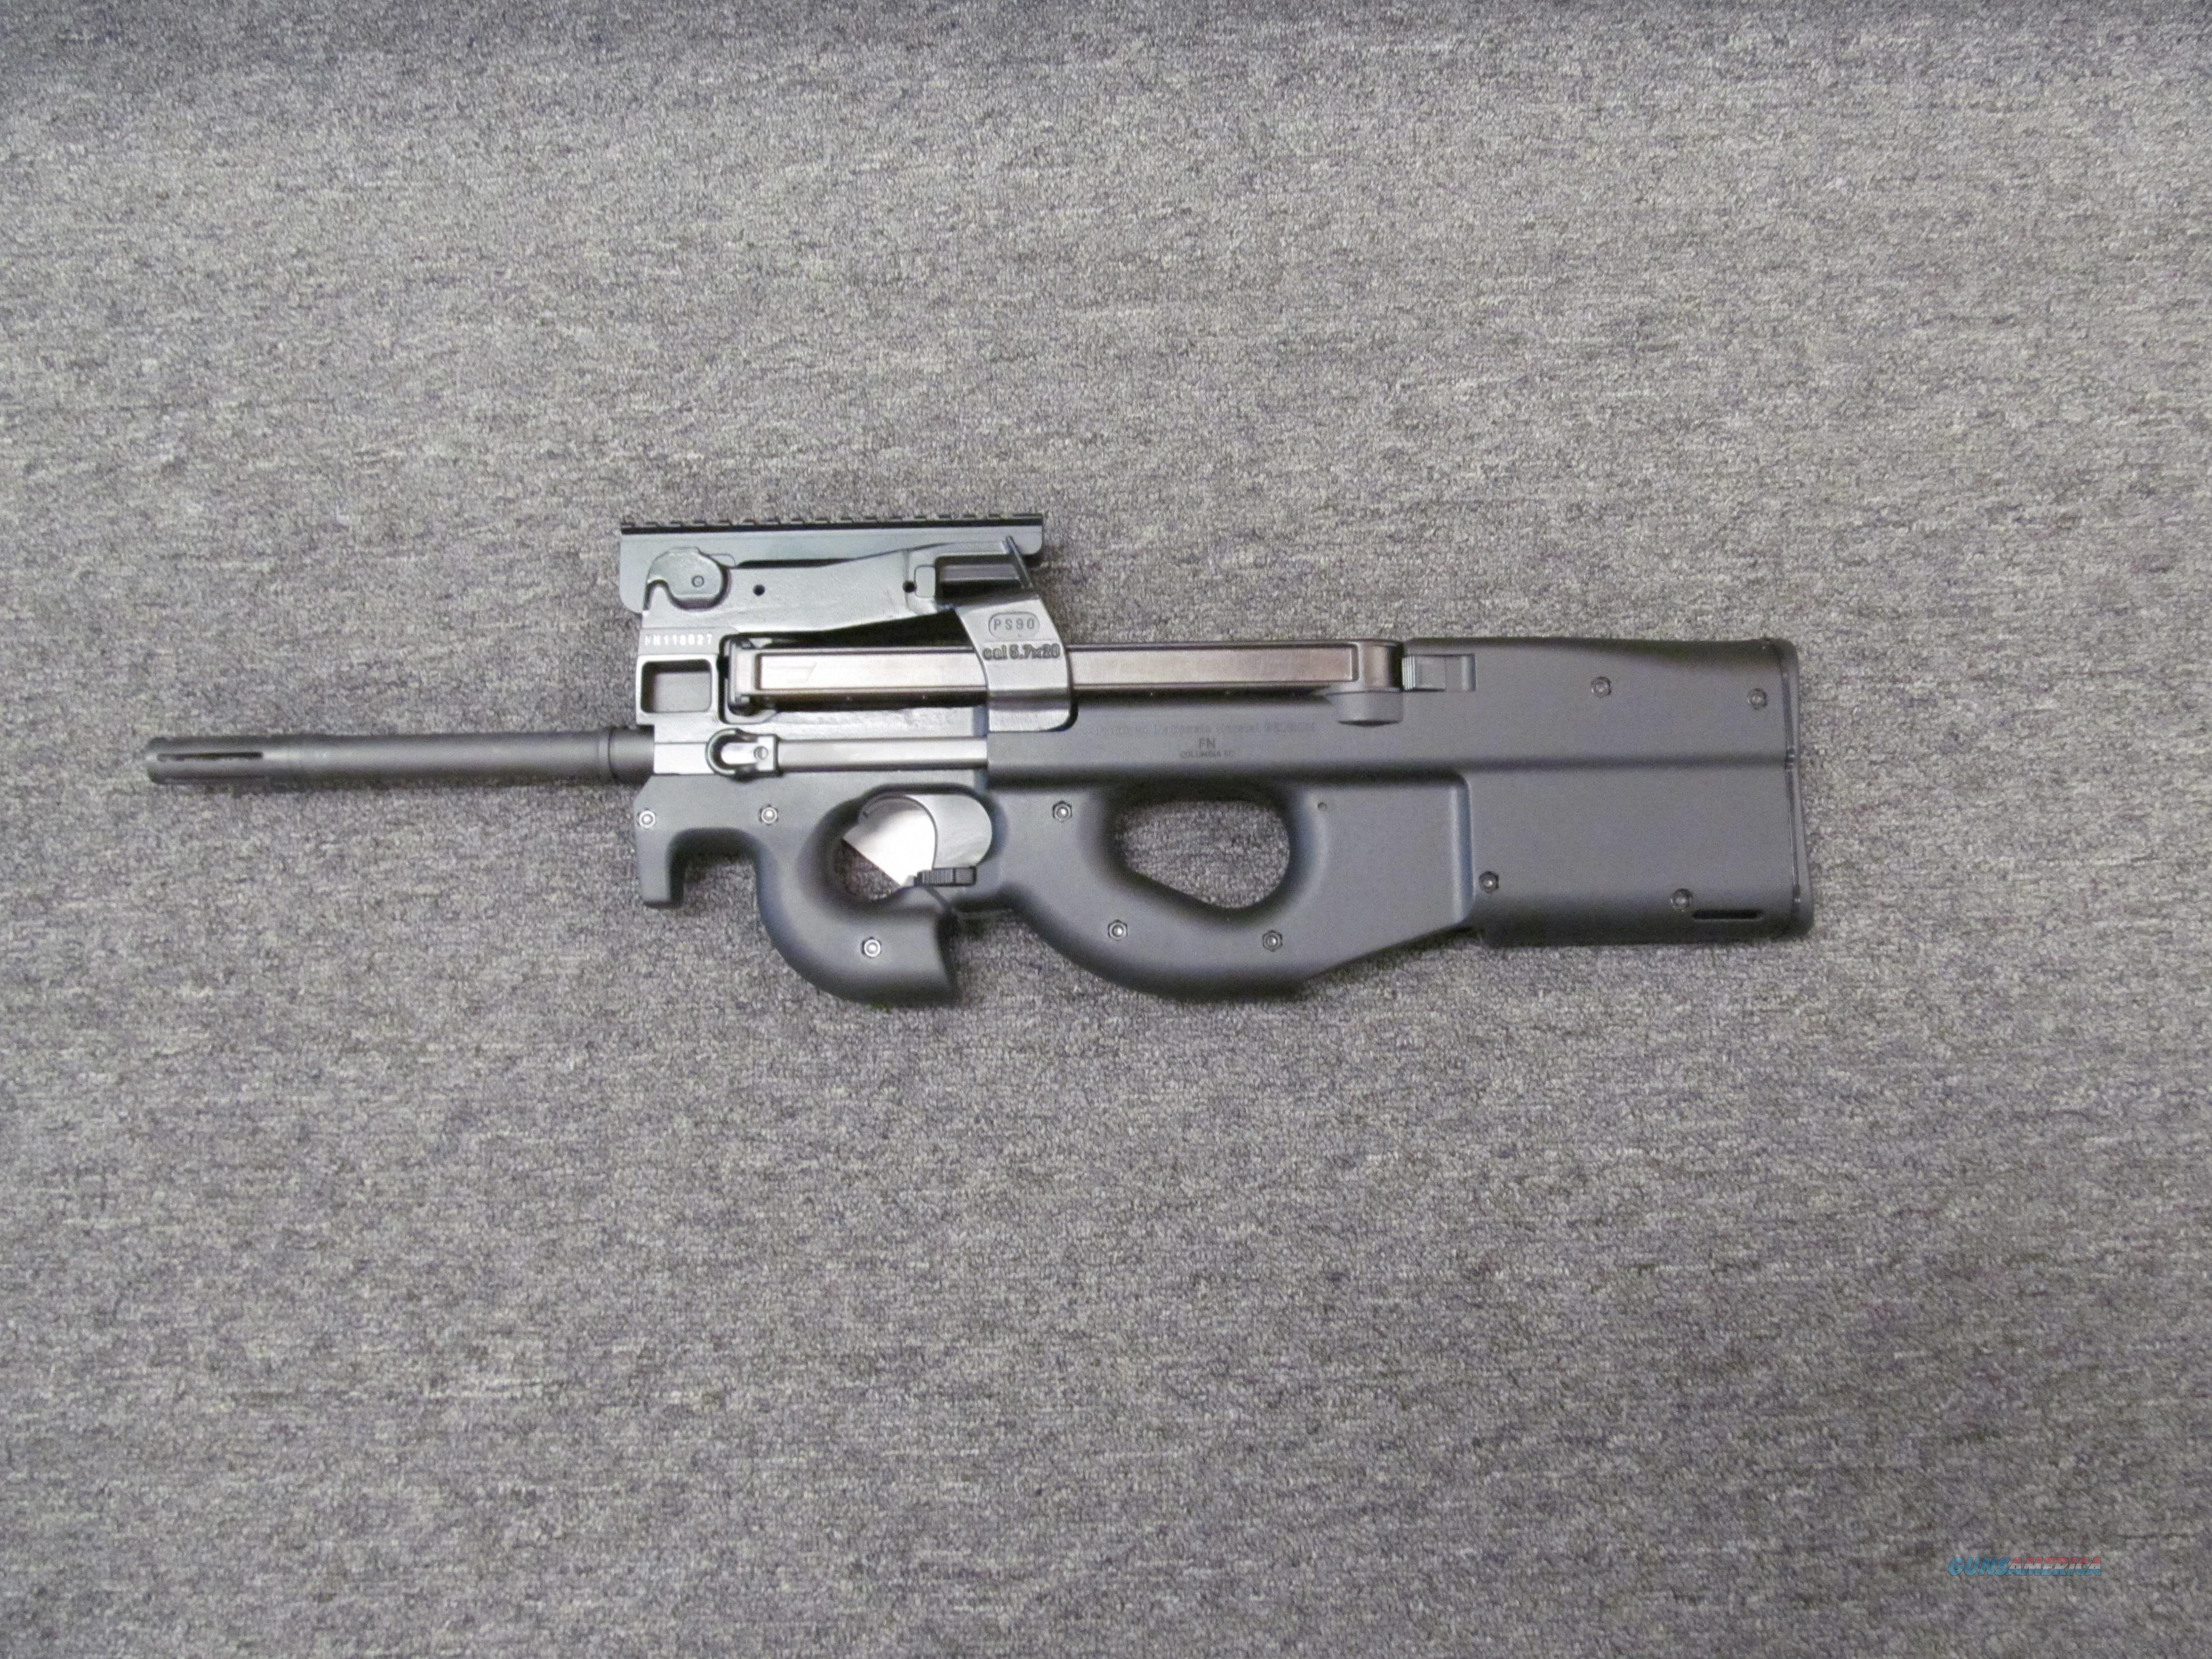 FNH PS90  Guns > Rifles > FNH - Fabrique Nationale (FN) Rifles > Semi-auto > PS90